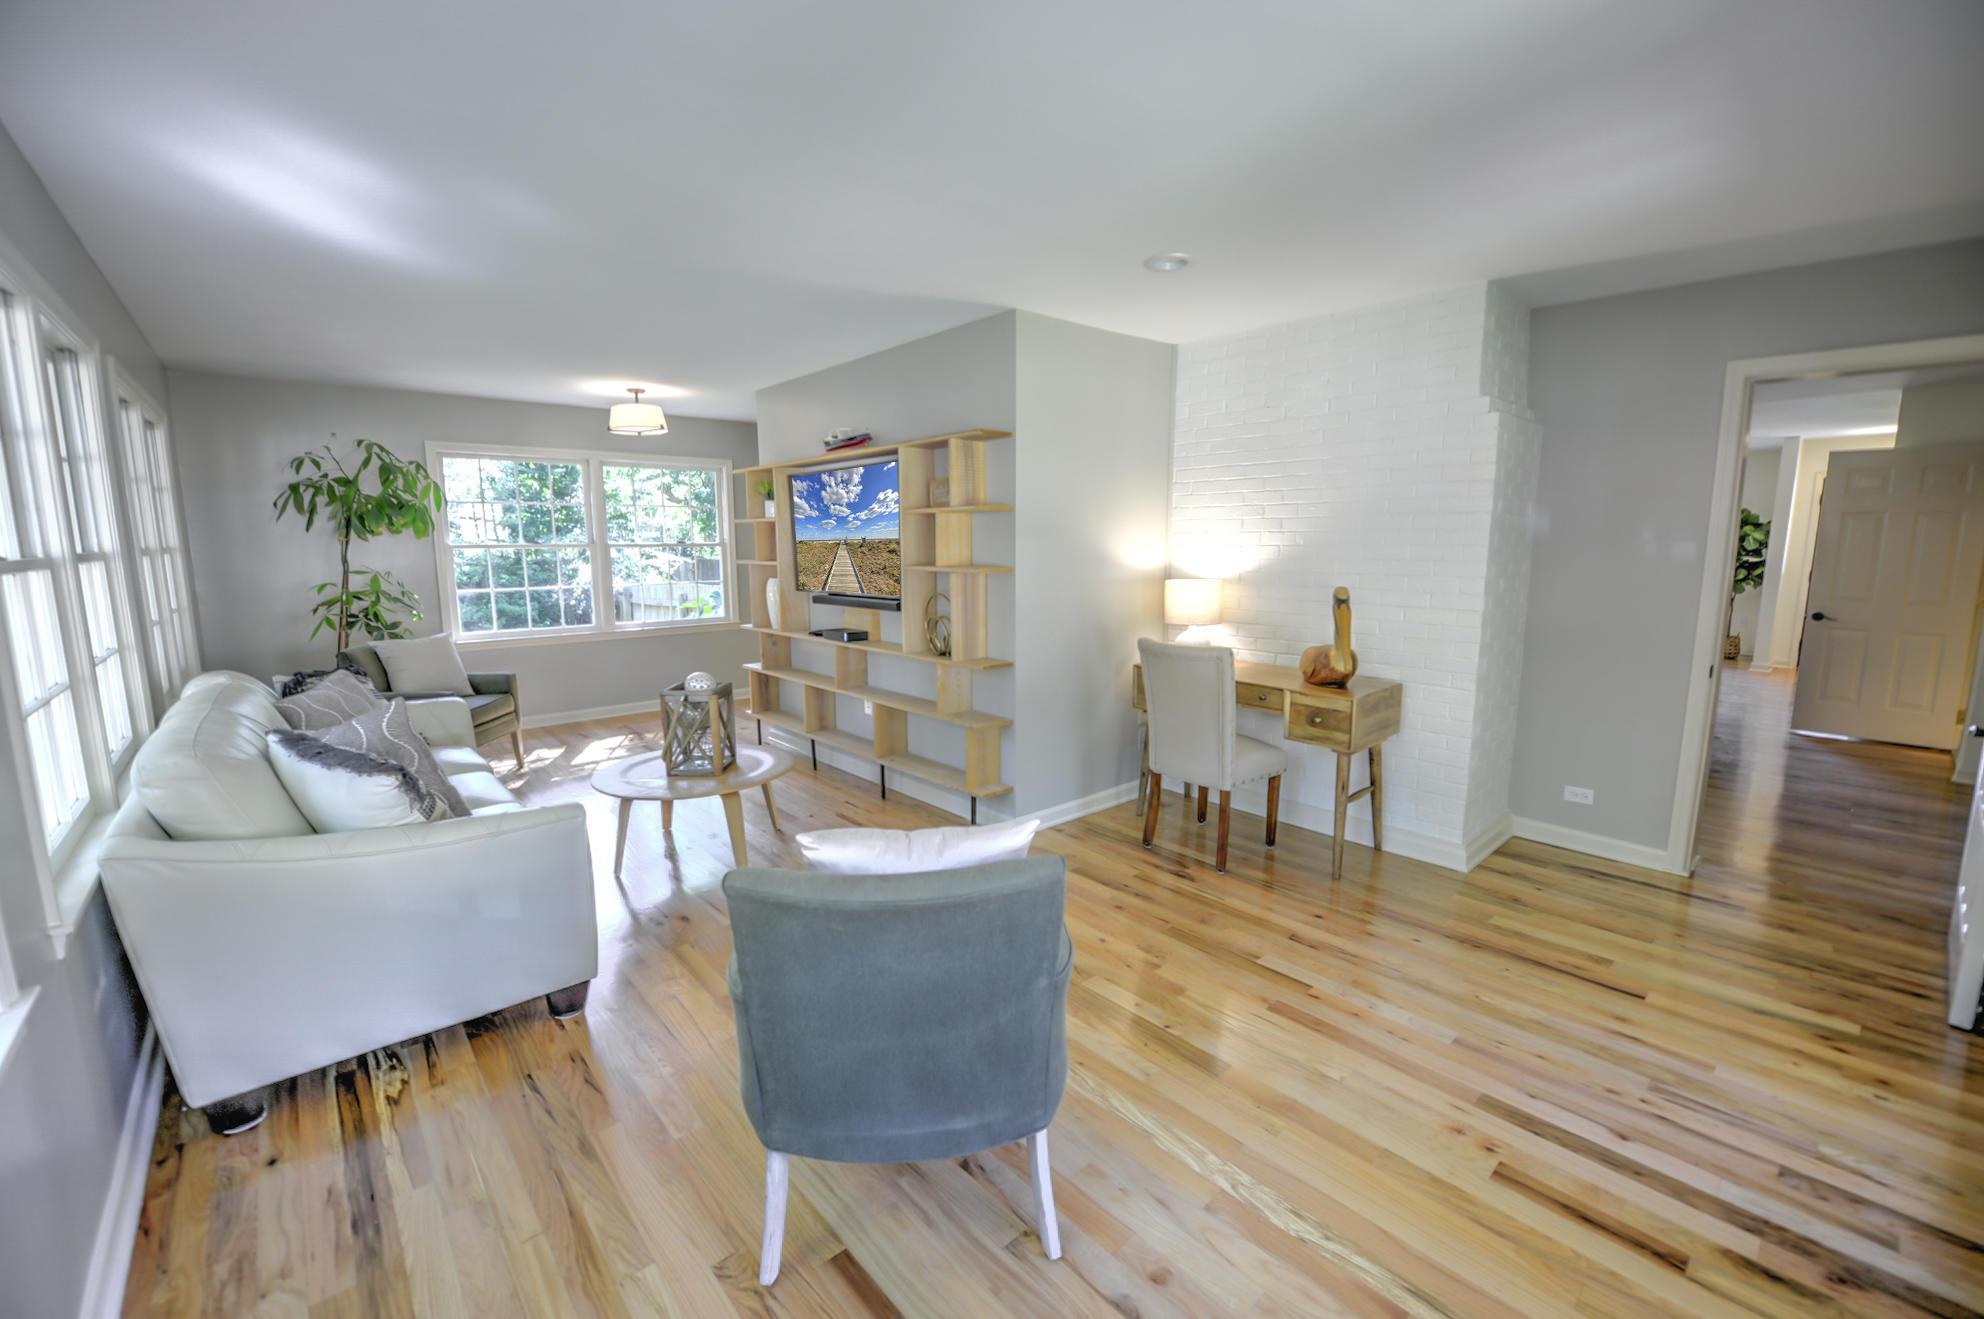 Shemwood II Homes For Sale - 1017 Jack Snipe, Mount Pleasant, SC - 28